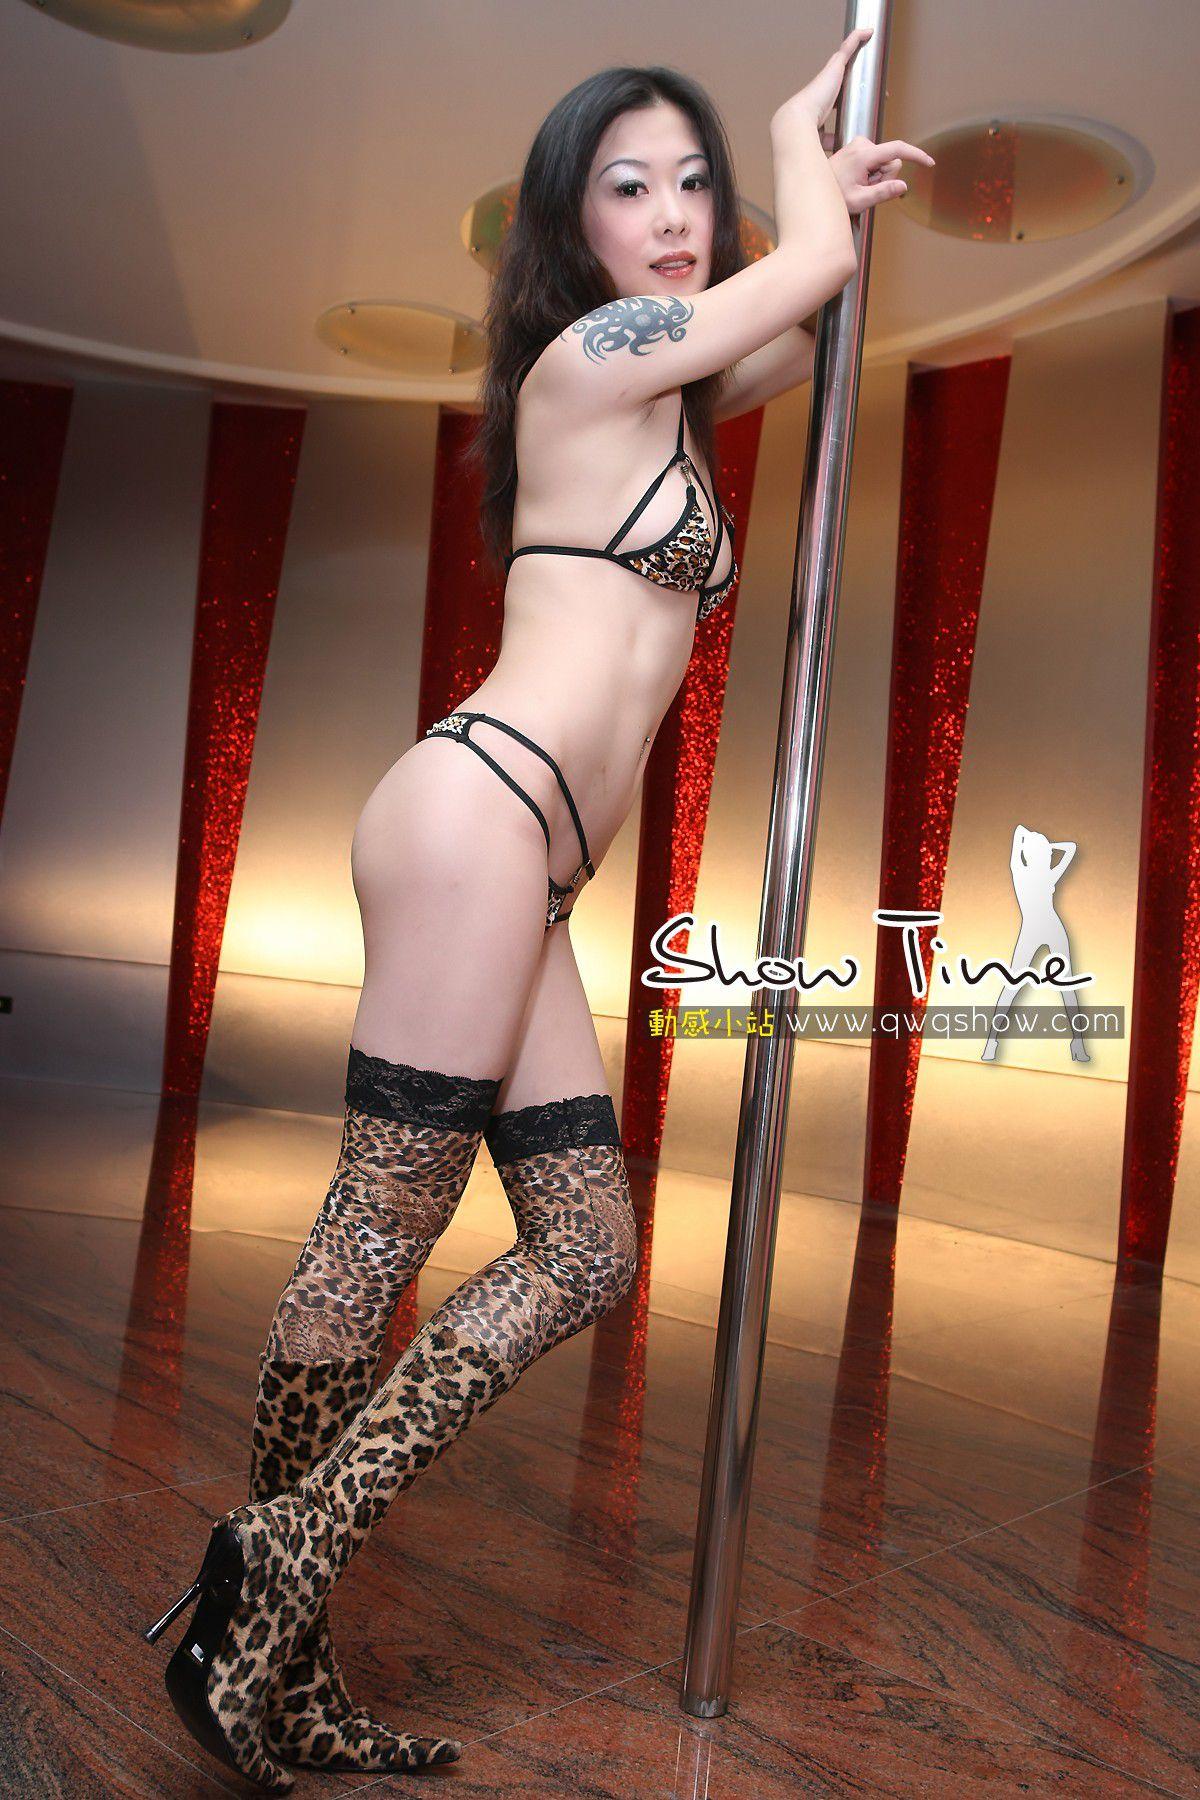 VOL.1177 [动感之星]豹纹美女钢管舞:蓉儿(动感小站蓉儿,动感之星蓉儿)高品质写真套图(45P)